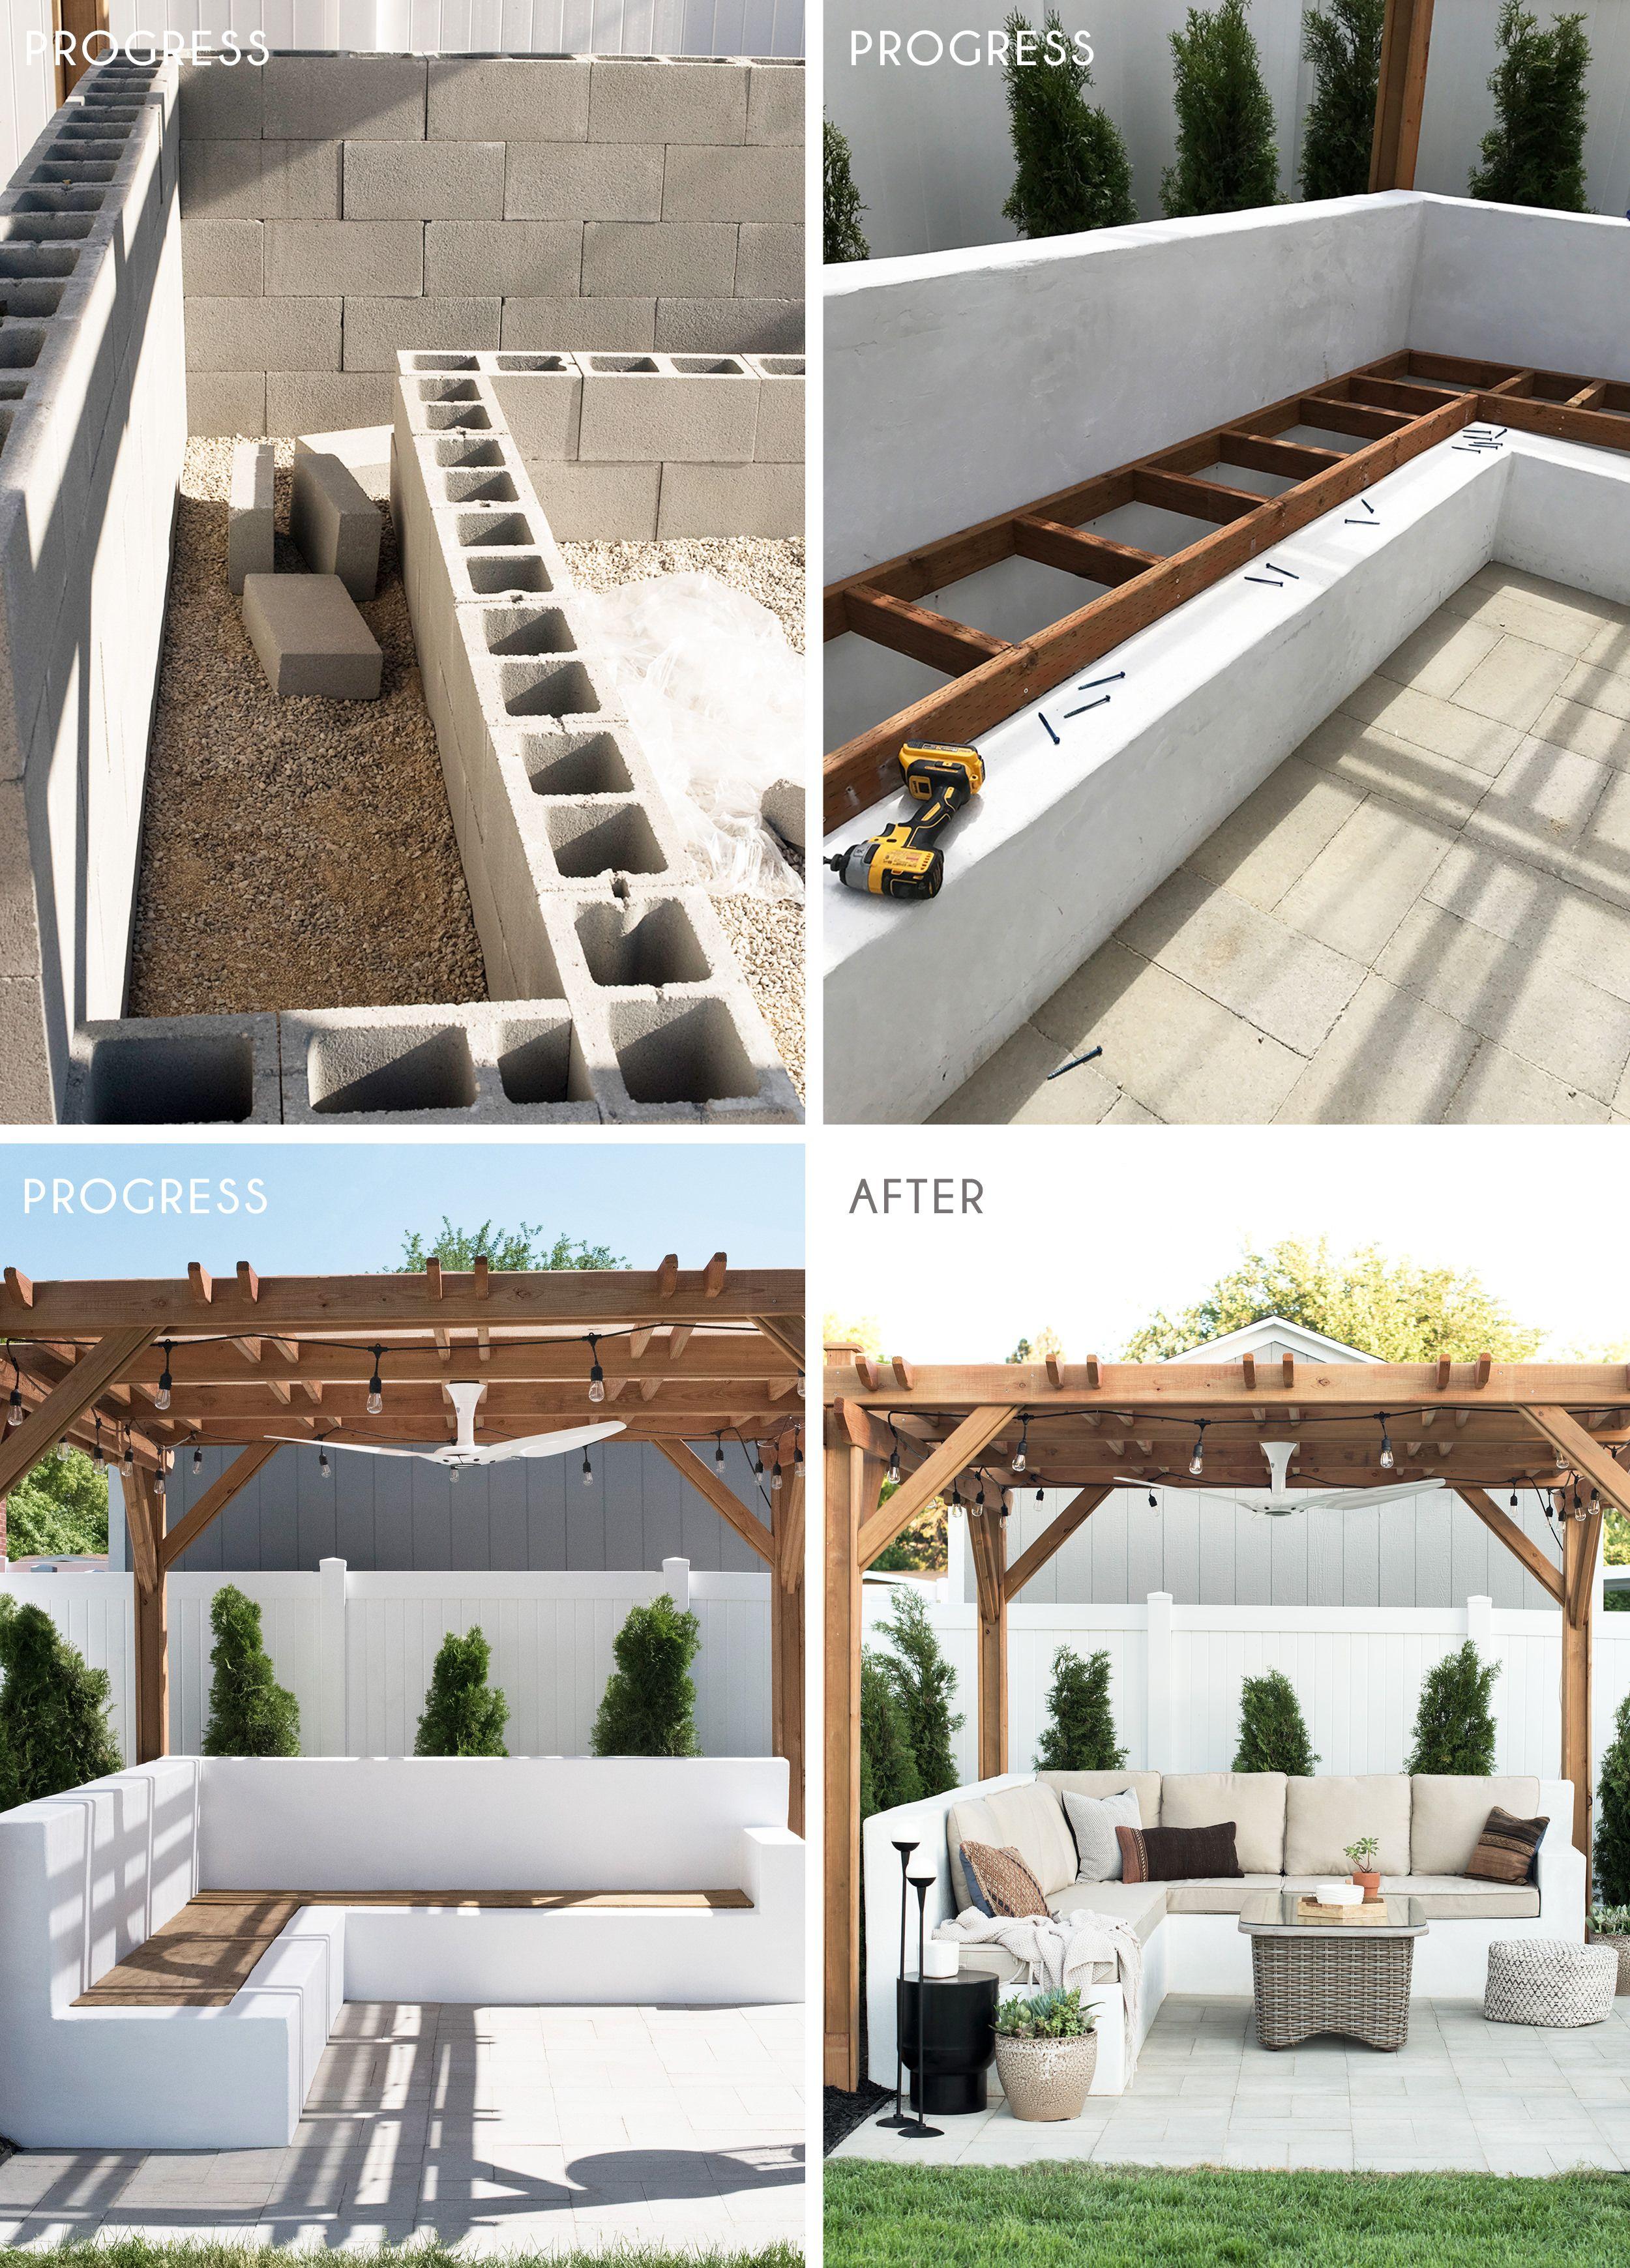 10 Doable Diy Ideas To Transform Your Backyard Hardscape Backyard Backyard Backyard Landscaping Designs